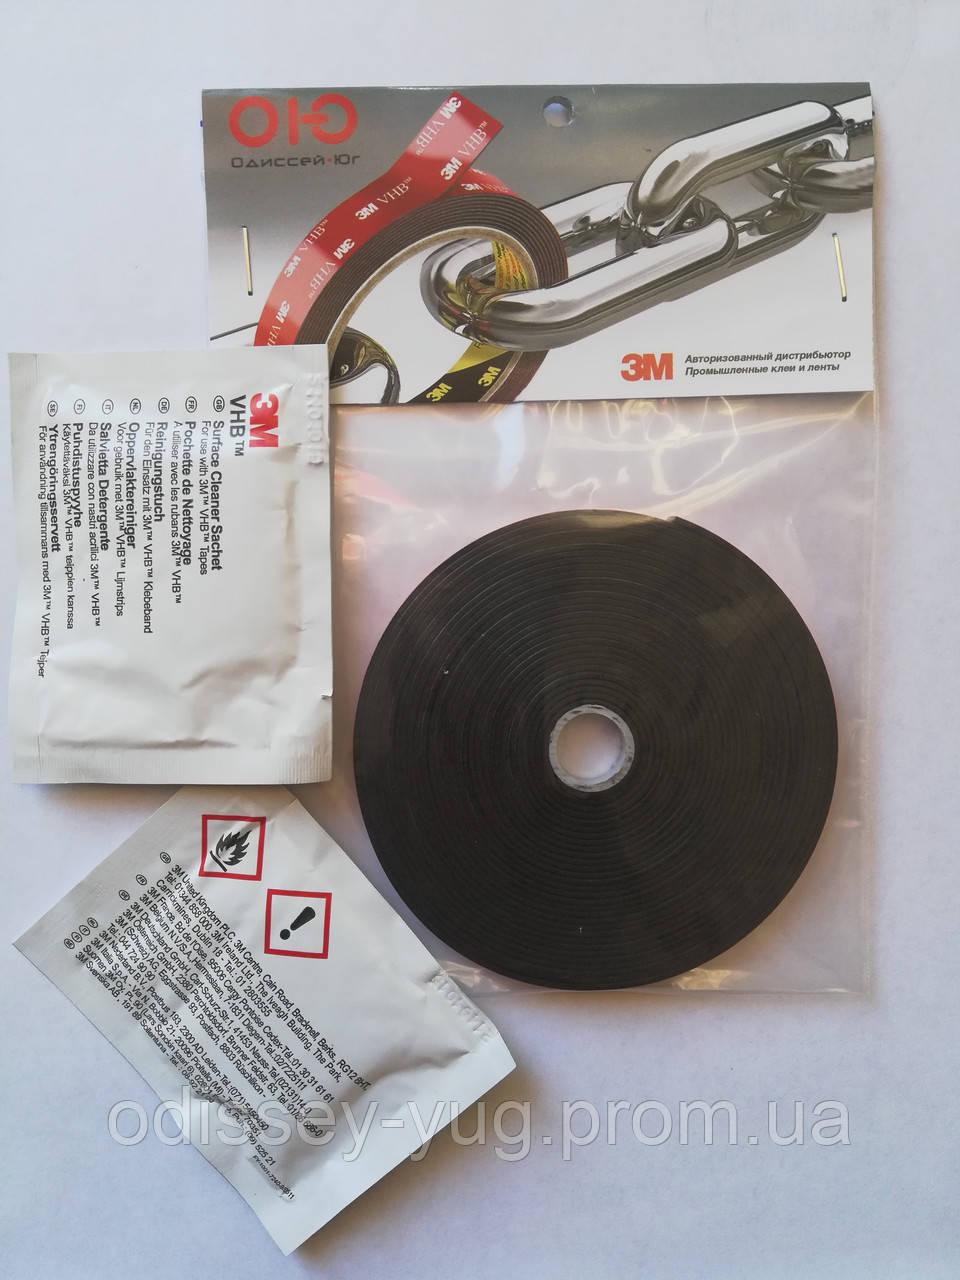 Набор 3М для монтажа ветровиков (скотч, салфетки), фото 1